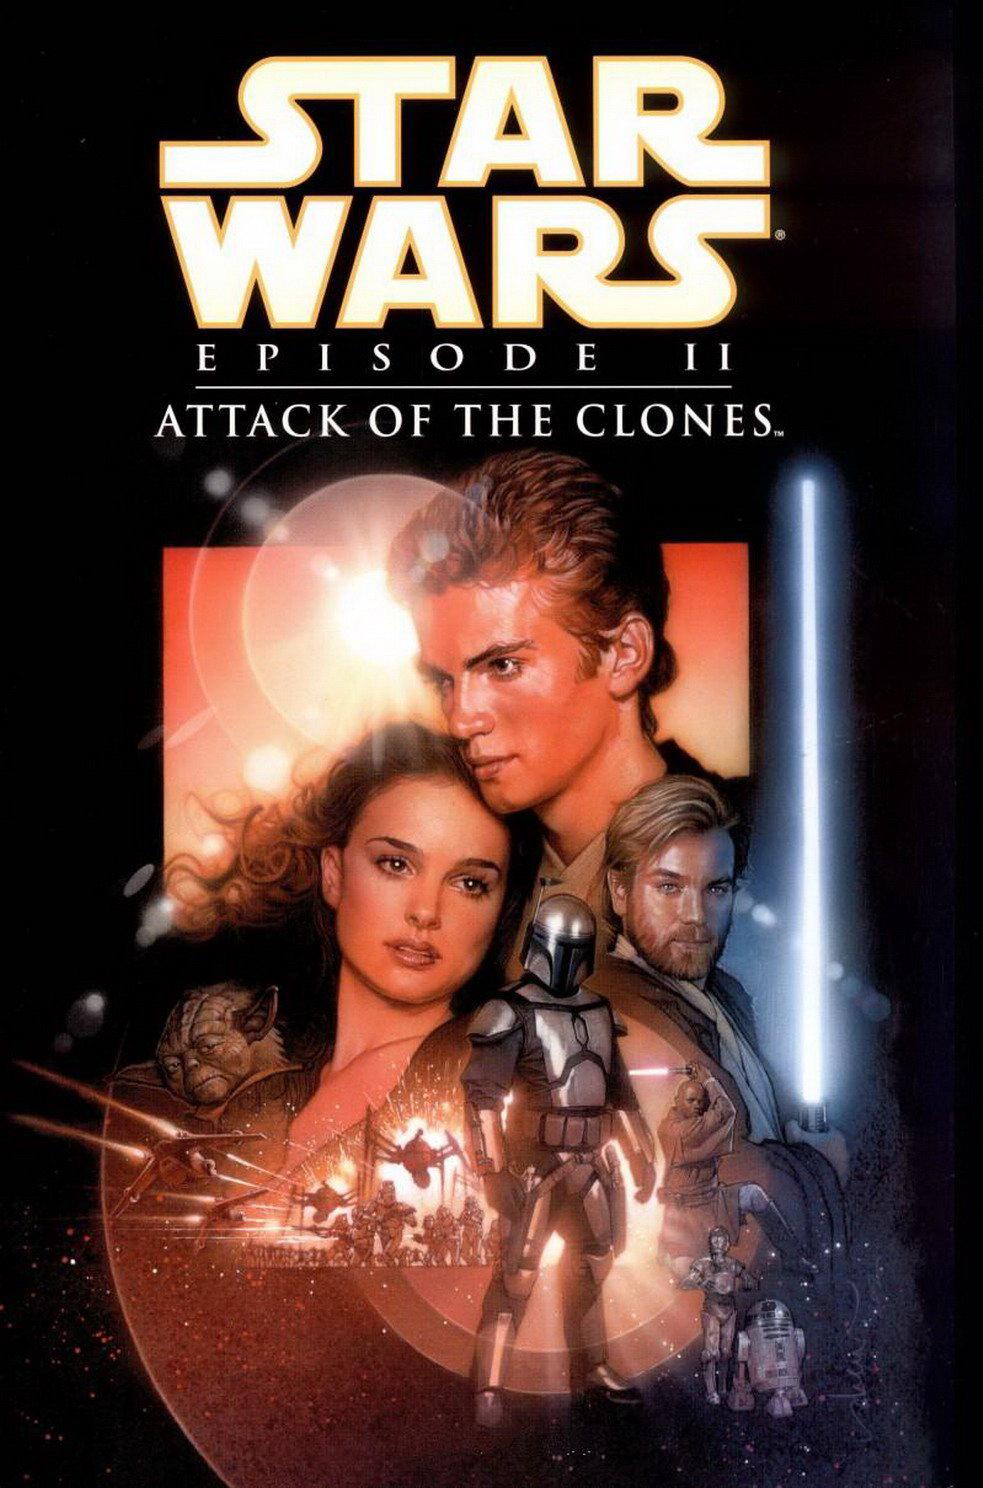 Star Wars Episode Ii Attack Of The Clones Wallpapers Movie Hq Star Wars Episode Ii Attack Of The Clones Pictures 4k Wallpapers 2019